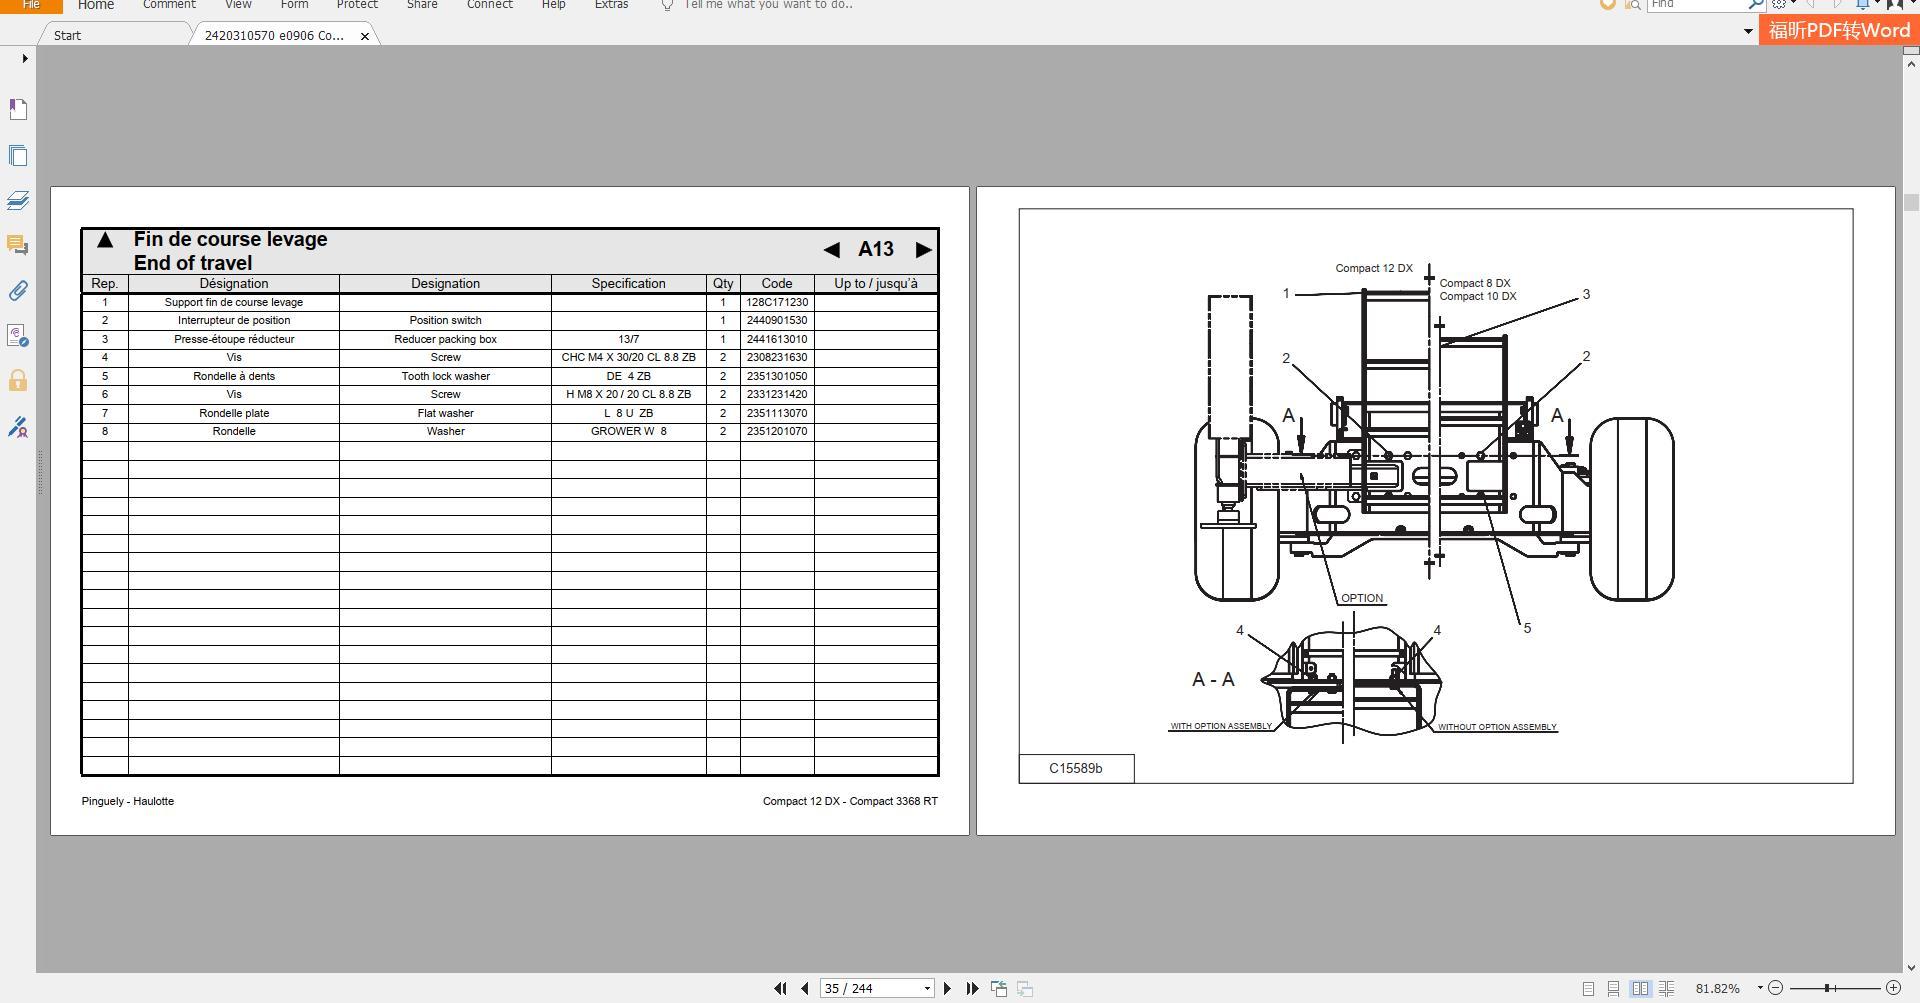 Haulotte_Work_Platforms_and_Telehandlers_Service_Maintenance_Operators_Manual_Training_Spare_Parts_Manual_DVD10